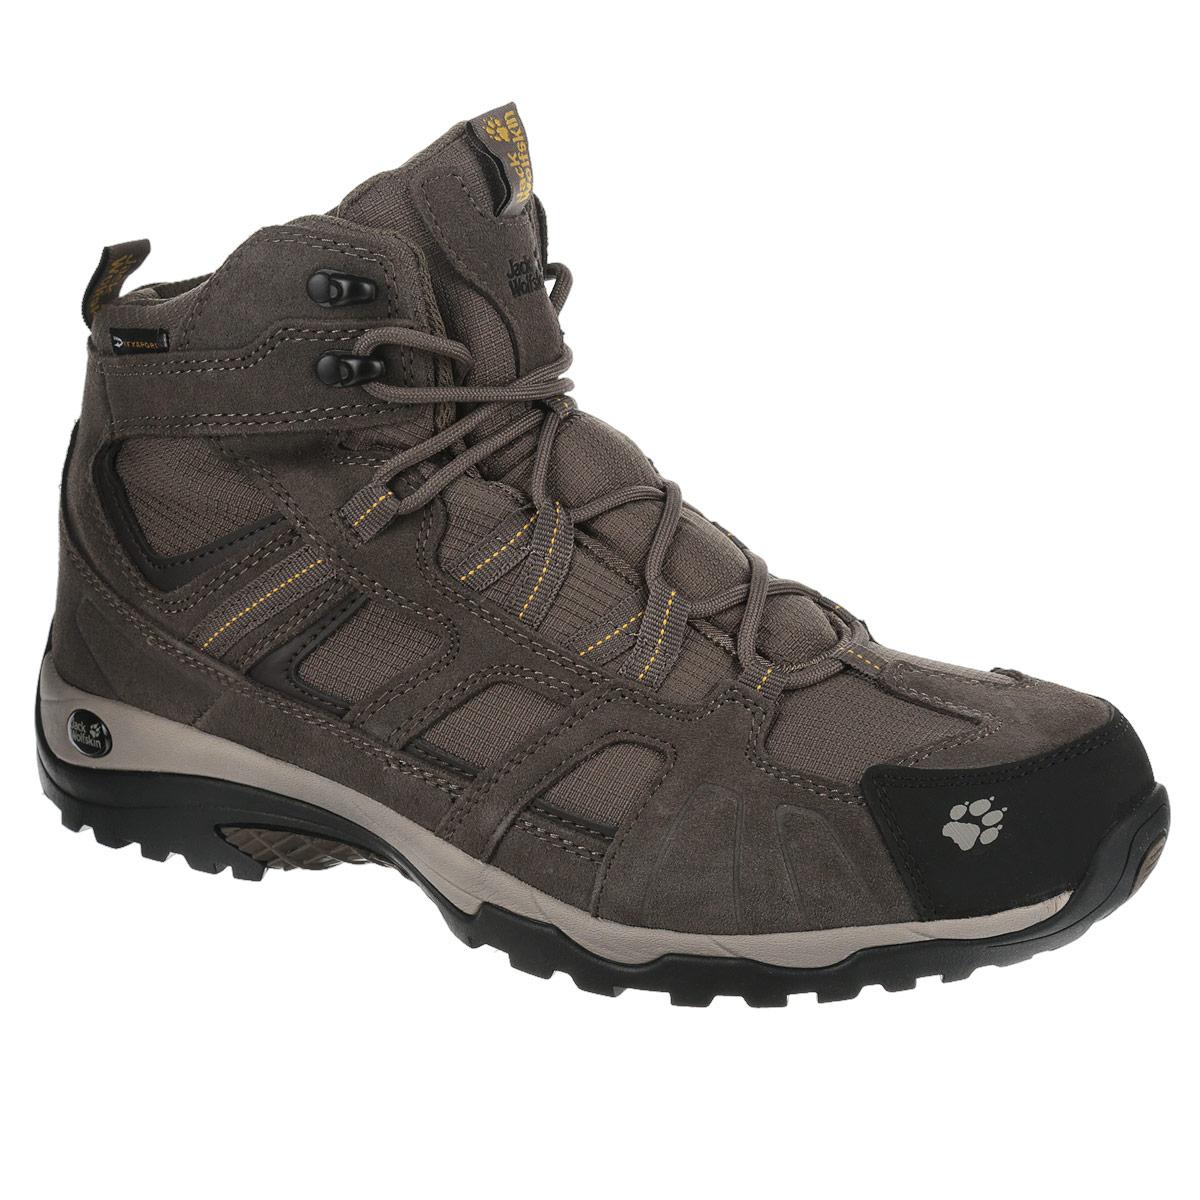 ������� ������� ����������� Vojo Hike Mid Texapore. 4011361 - Jack Wolfskin4011361-1010������� ����������� ������� ������� Vojo Hike Mid Texapore �� Jack Wolfskin ��������� �������� ��� ������� � ������ ��������. ���� ����� �������� �� ����������������� ����� �� ��������� �� ������� ����������� ����� ��� �������������� ��������������. ���������� ������� ��������� �� ��������������� ���������� � ����������������� ������� ��������� Texapore. �������� ������� ��������� ������ �� ����. ������ ������. ��������� ������� �������� ���������, �� ������ � �� ������� ��������� � ���� �������� � �������� ������. ������ ������������ ������� �� EVA � ��������� �� ������������ ���������, ����������� ����������������� ����������. ������� ������ ������� ������������� ��� �������������� �������������� �������������. ��� ������� �� ������� �������, ����������� �� ������, ������������� ������, ������� ���������� ������� ������������ ����������� ��������� � ������������; ������ ���������� ������� �� EVA, ������� ����������� ������� ������� �������� � �������� �����������. �...